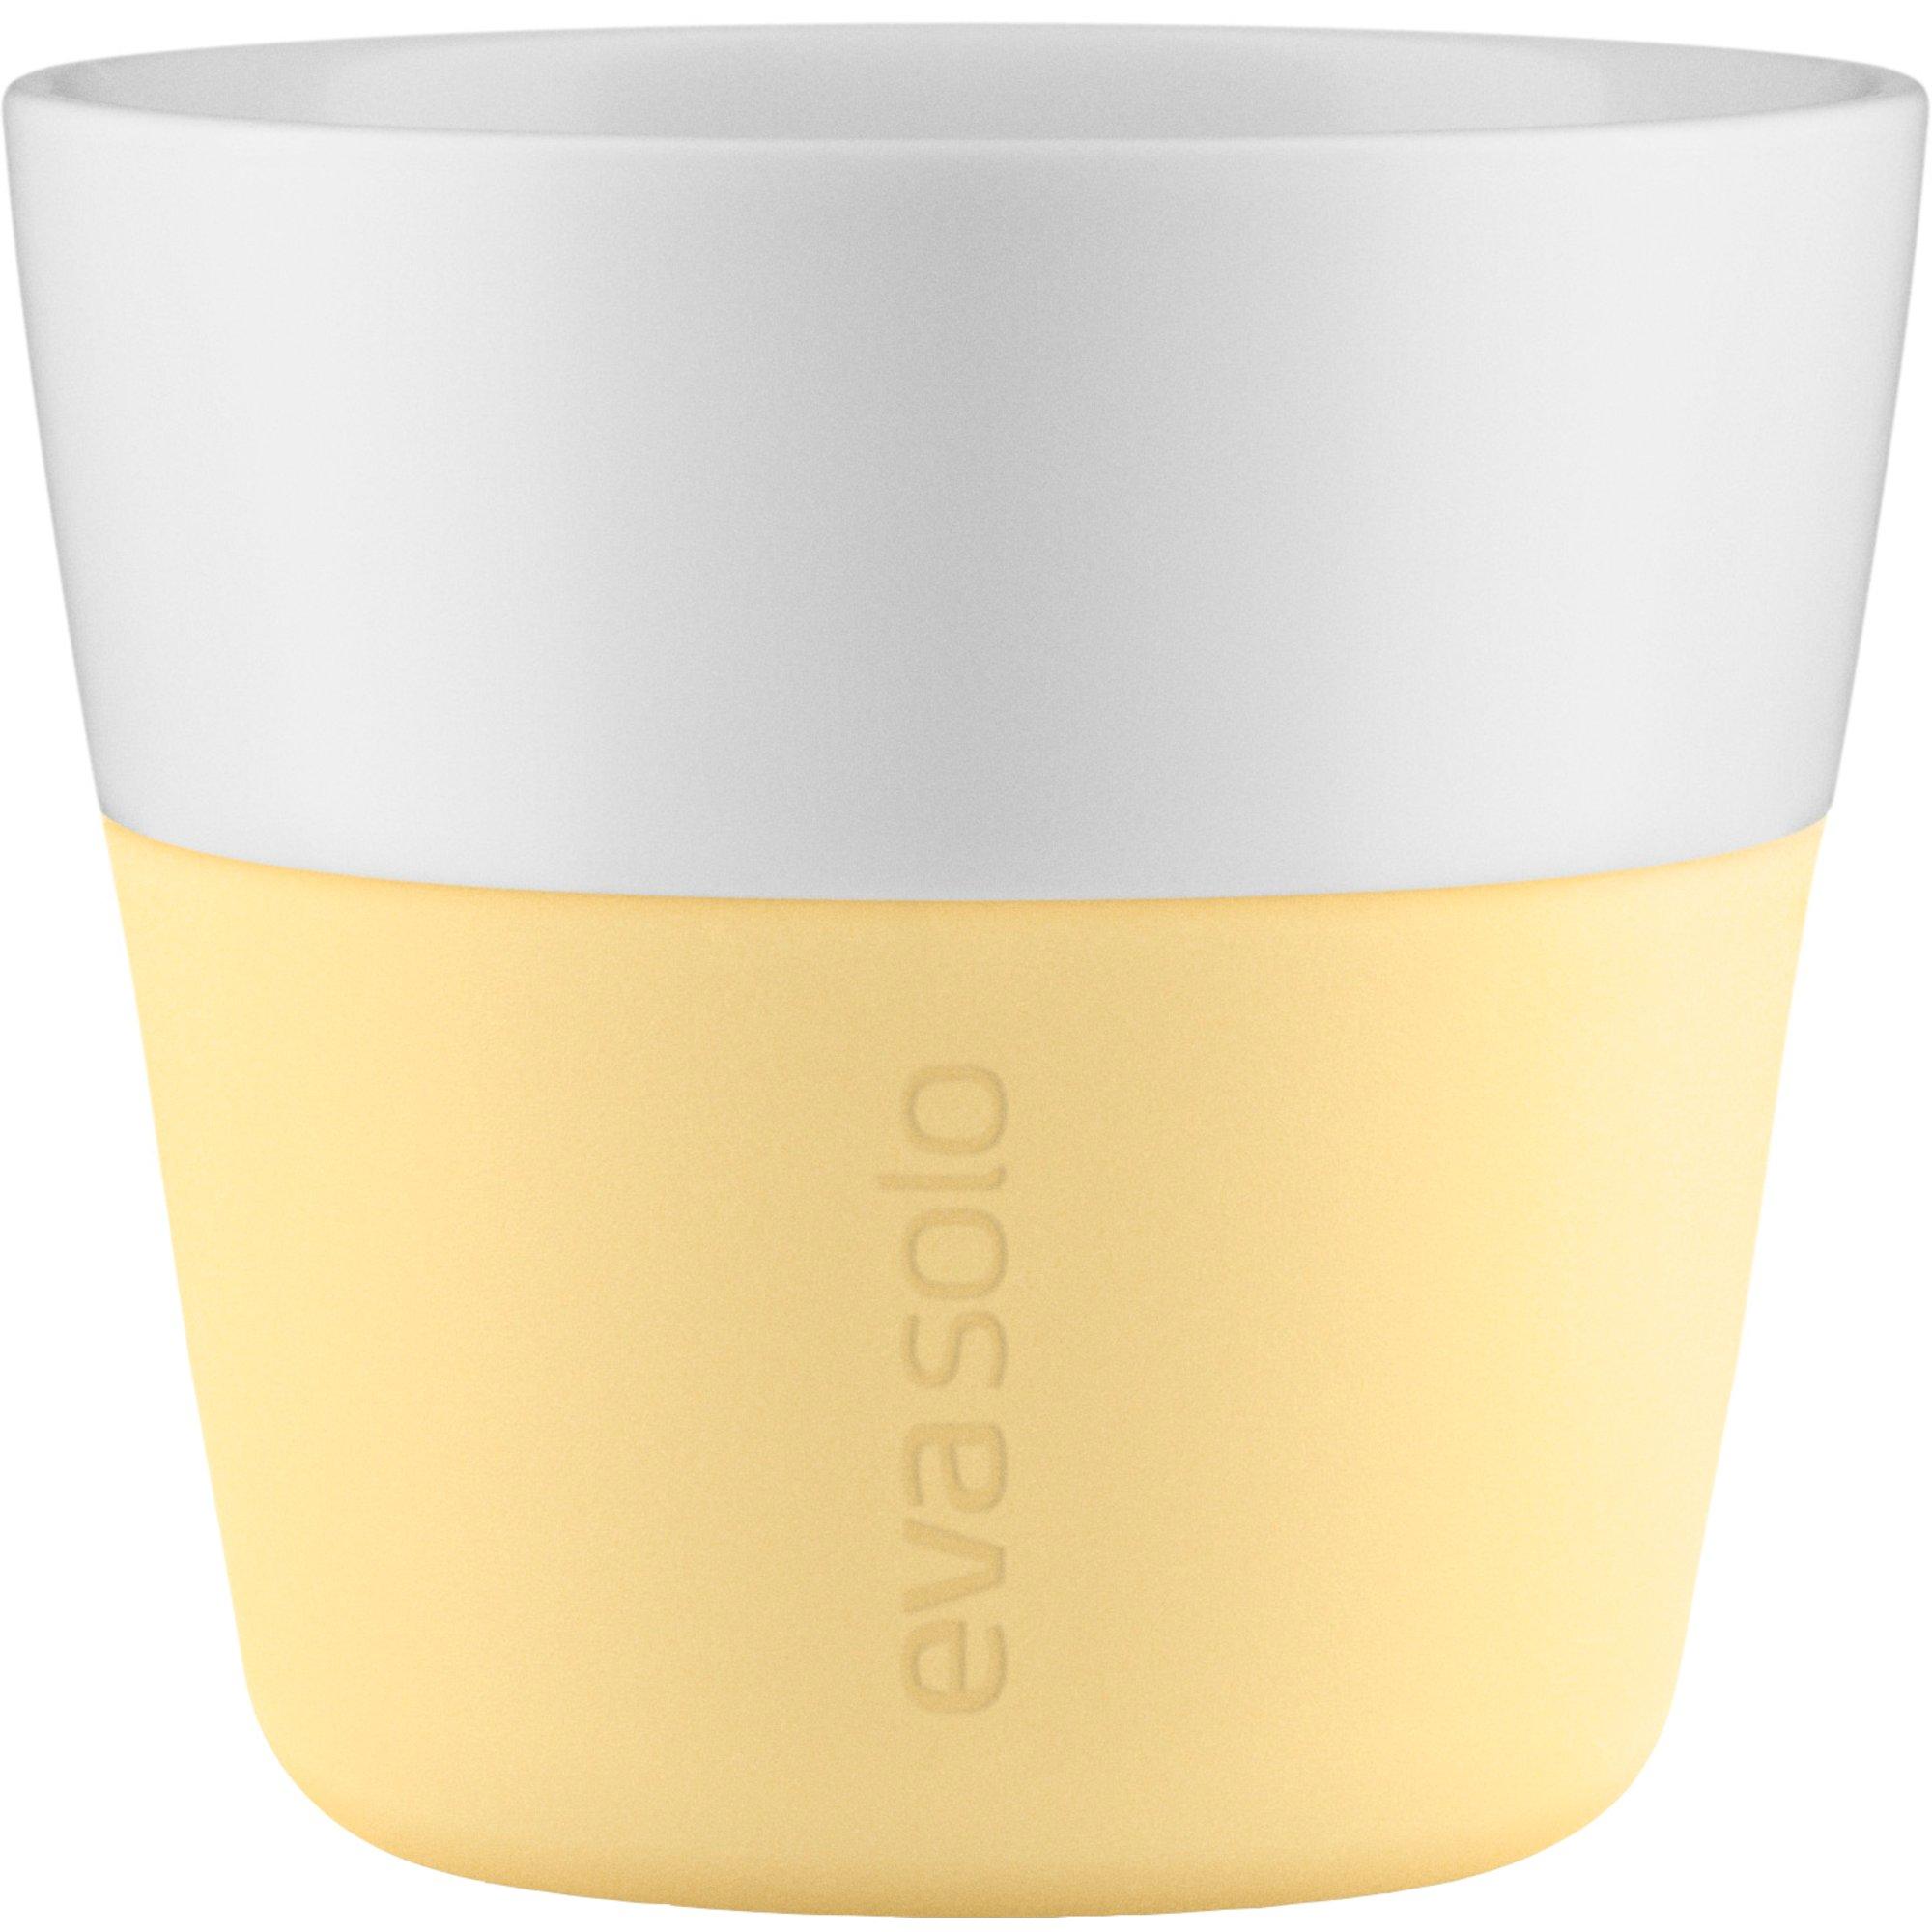 Lungo-mugg 2 st. Lemon drop